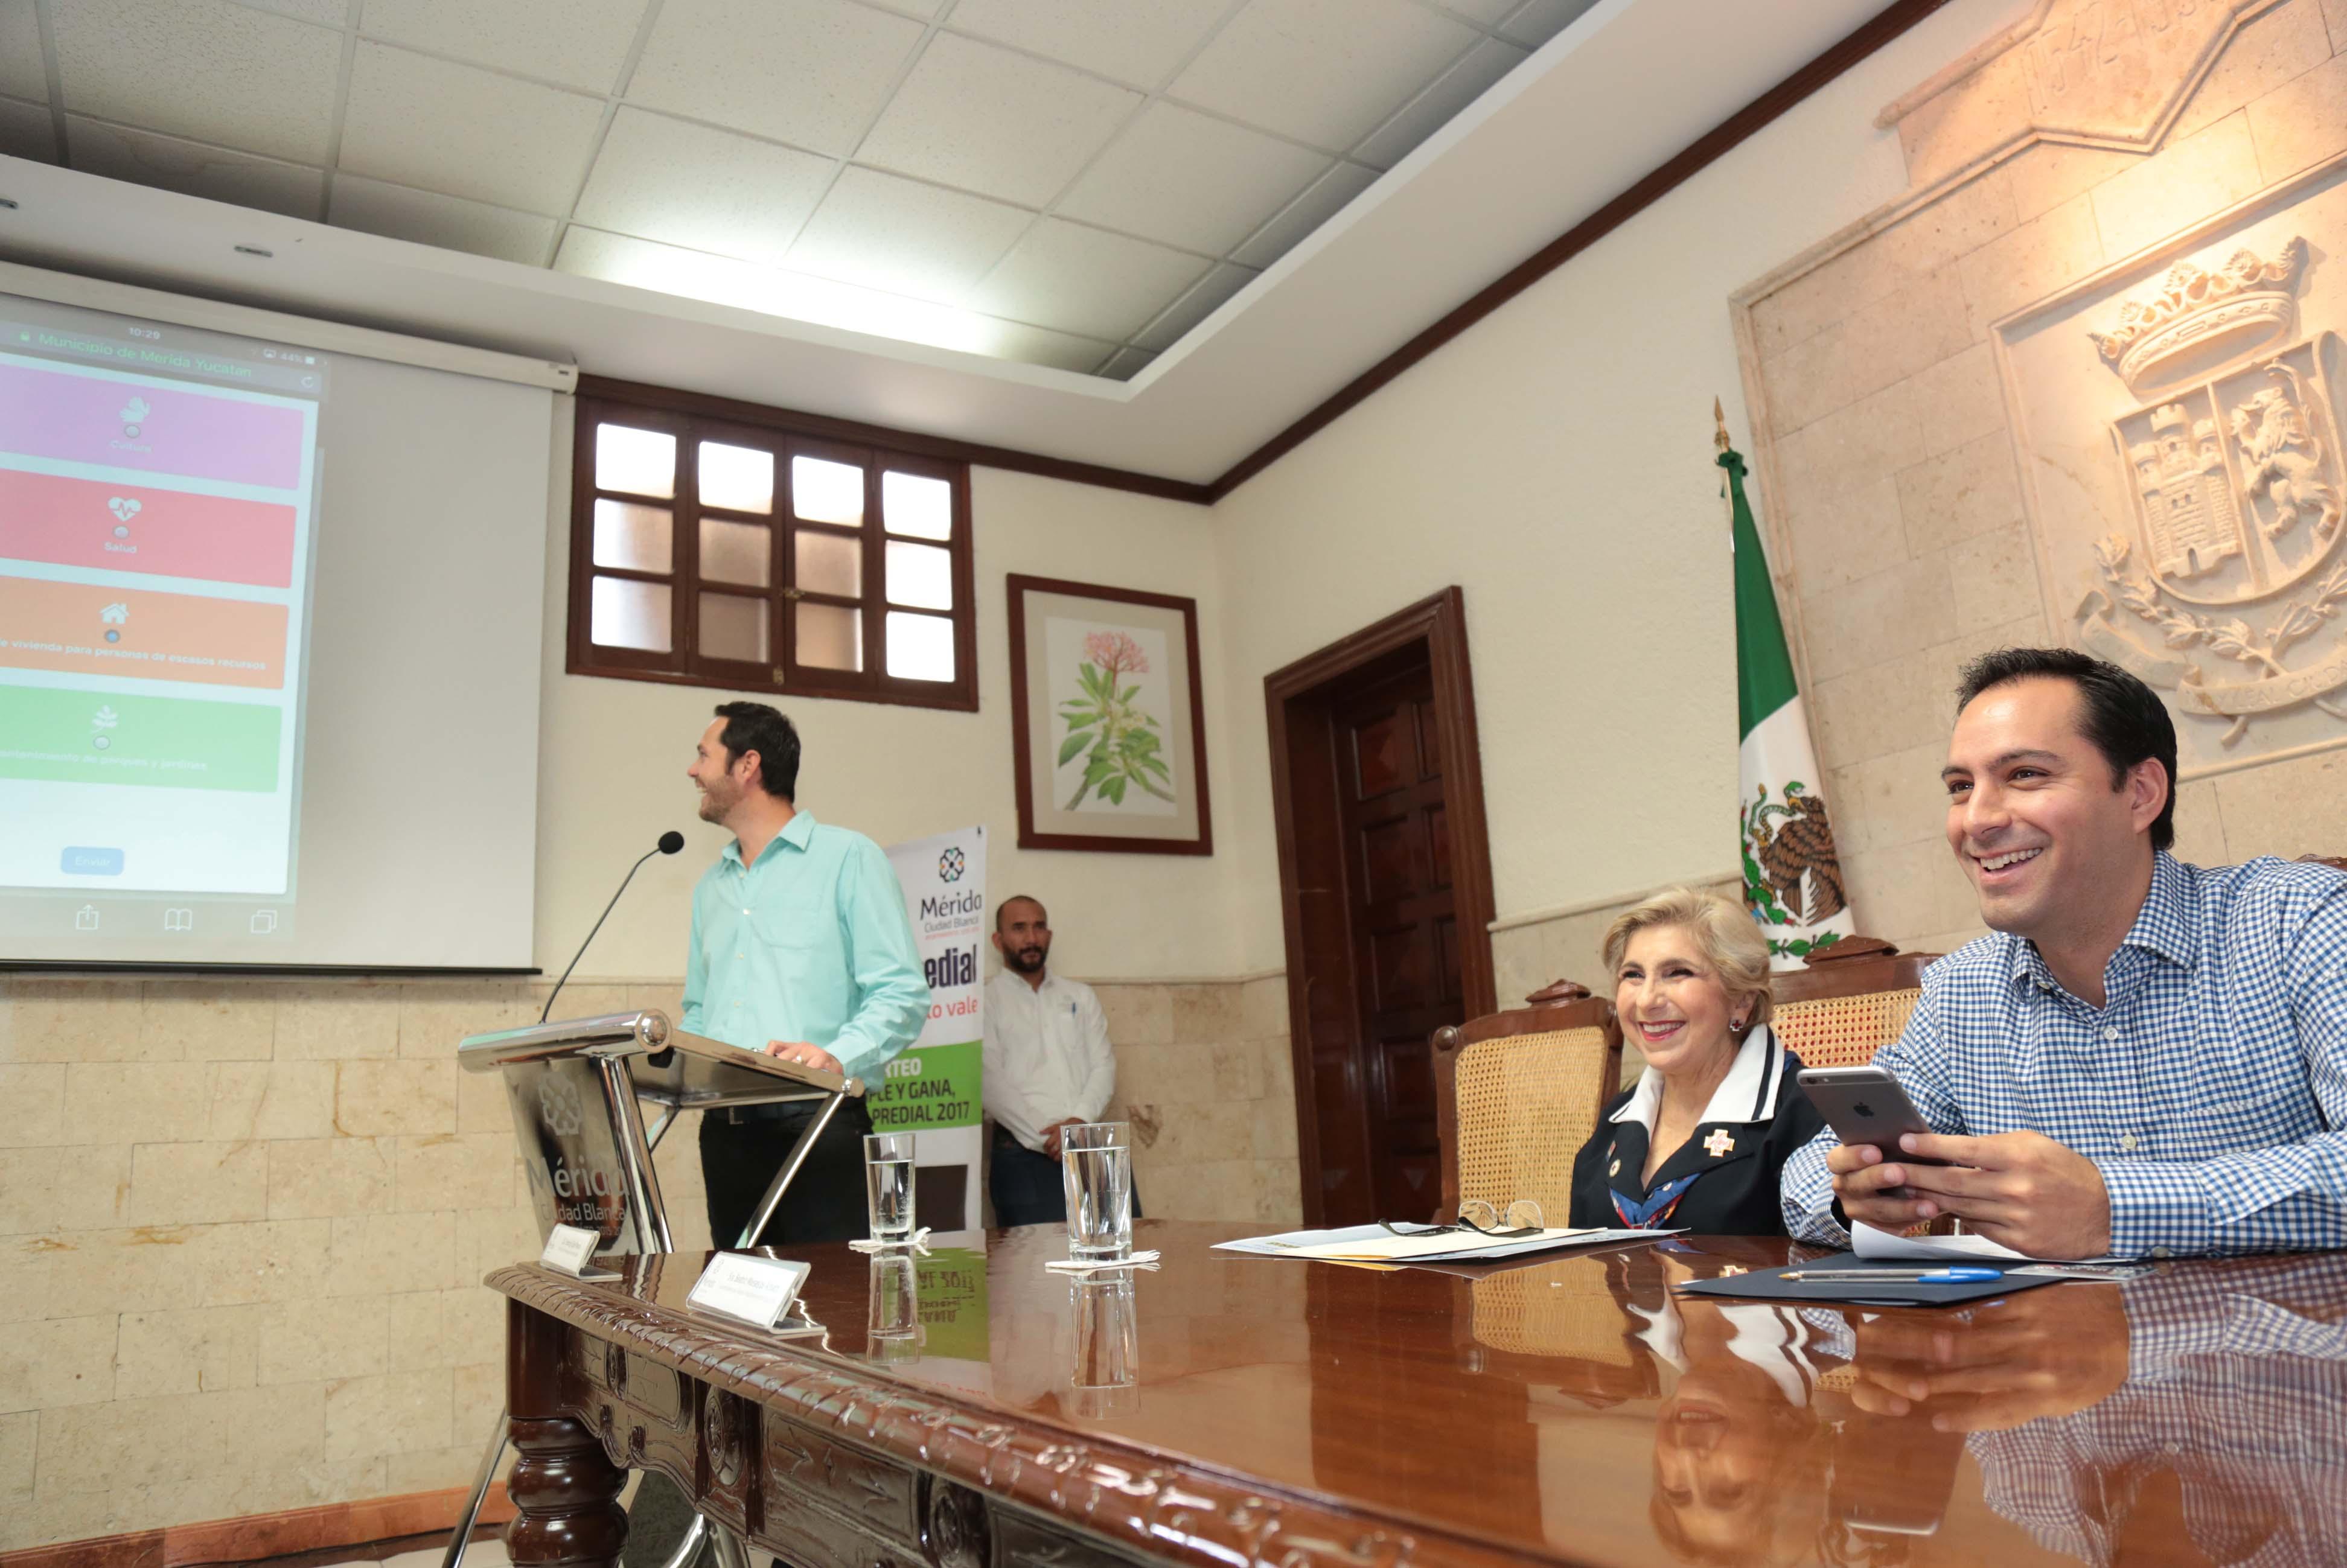 Finanzas estables en municipio de Mérida.- agencia internacional